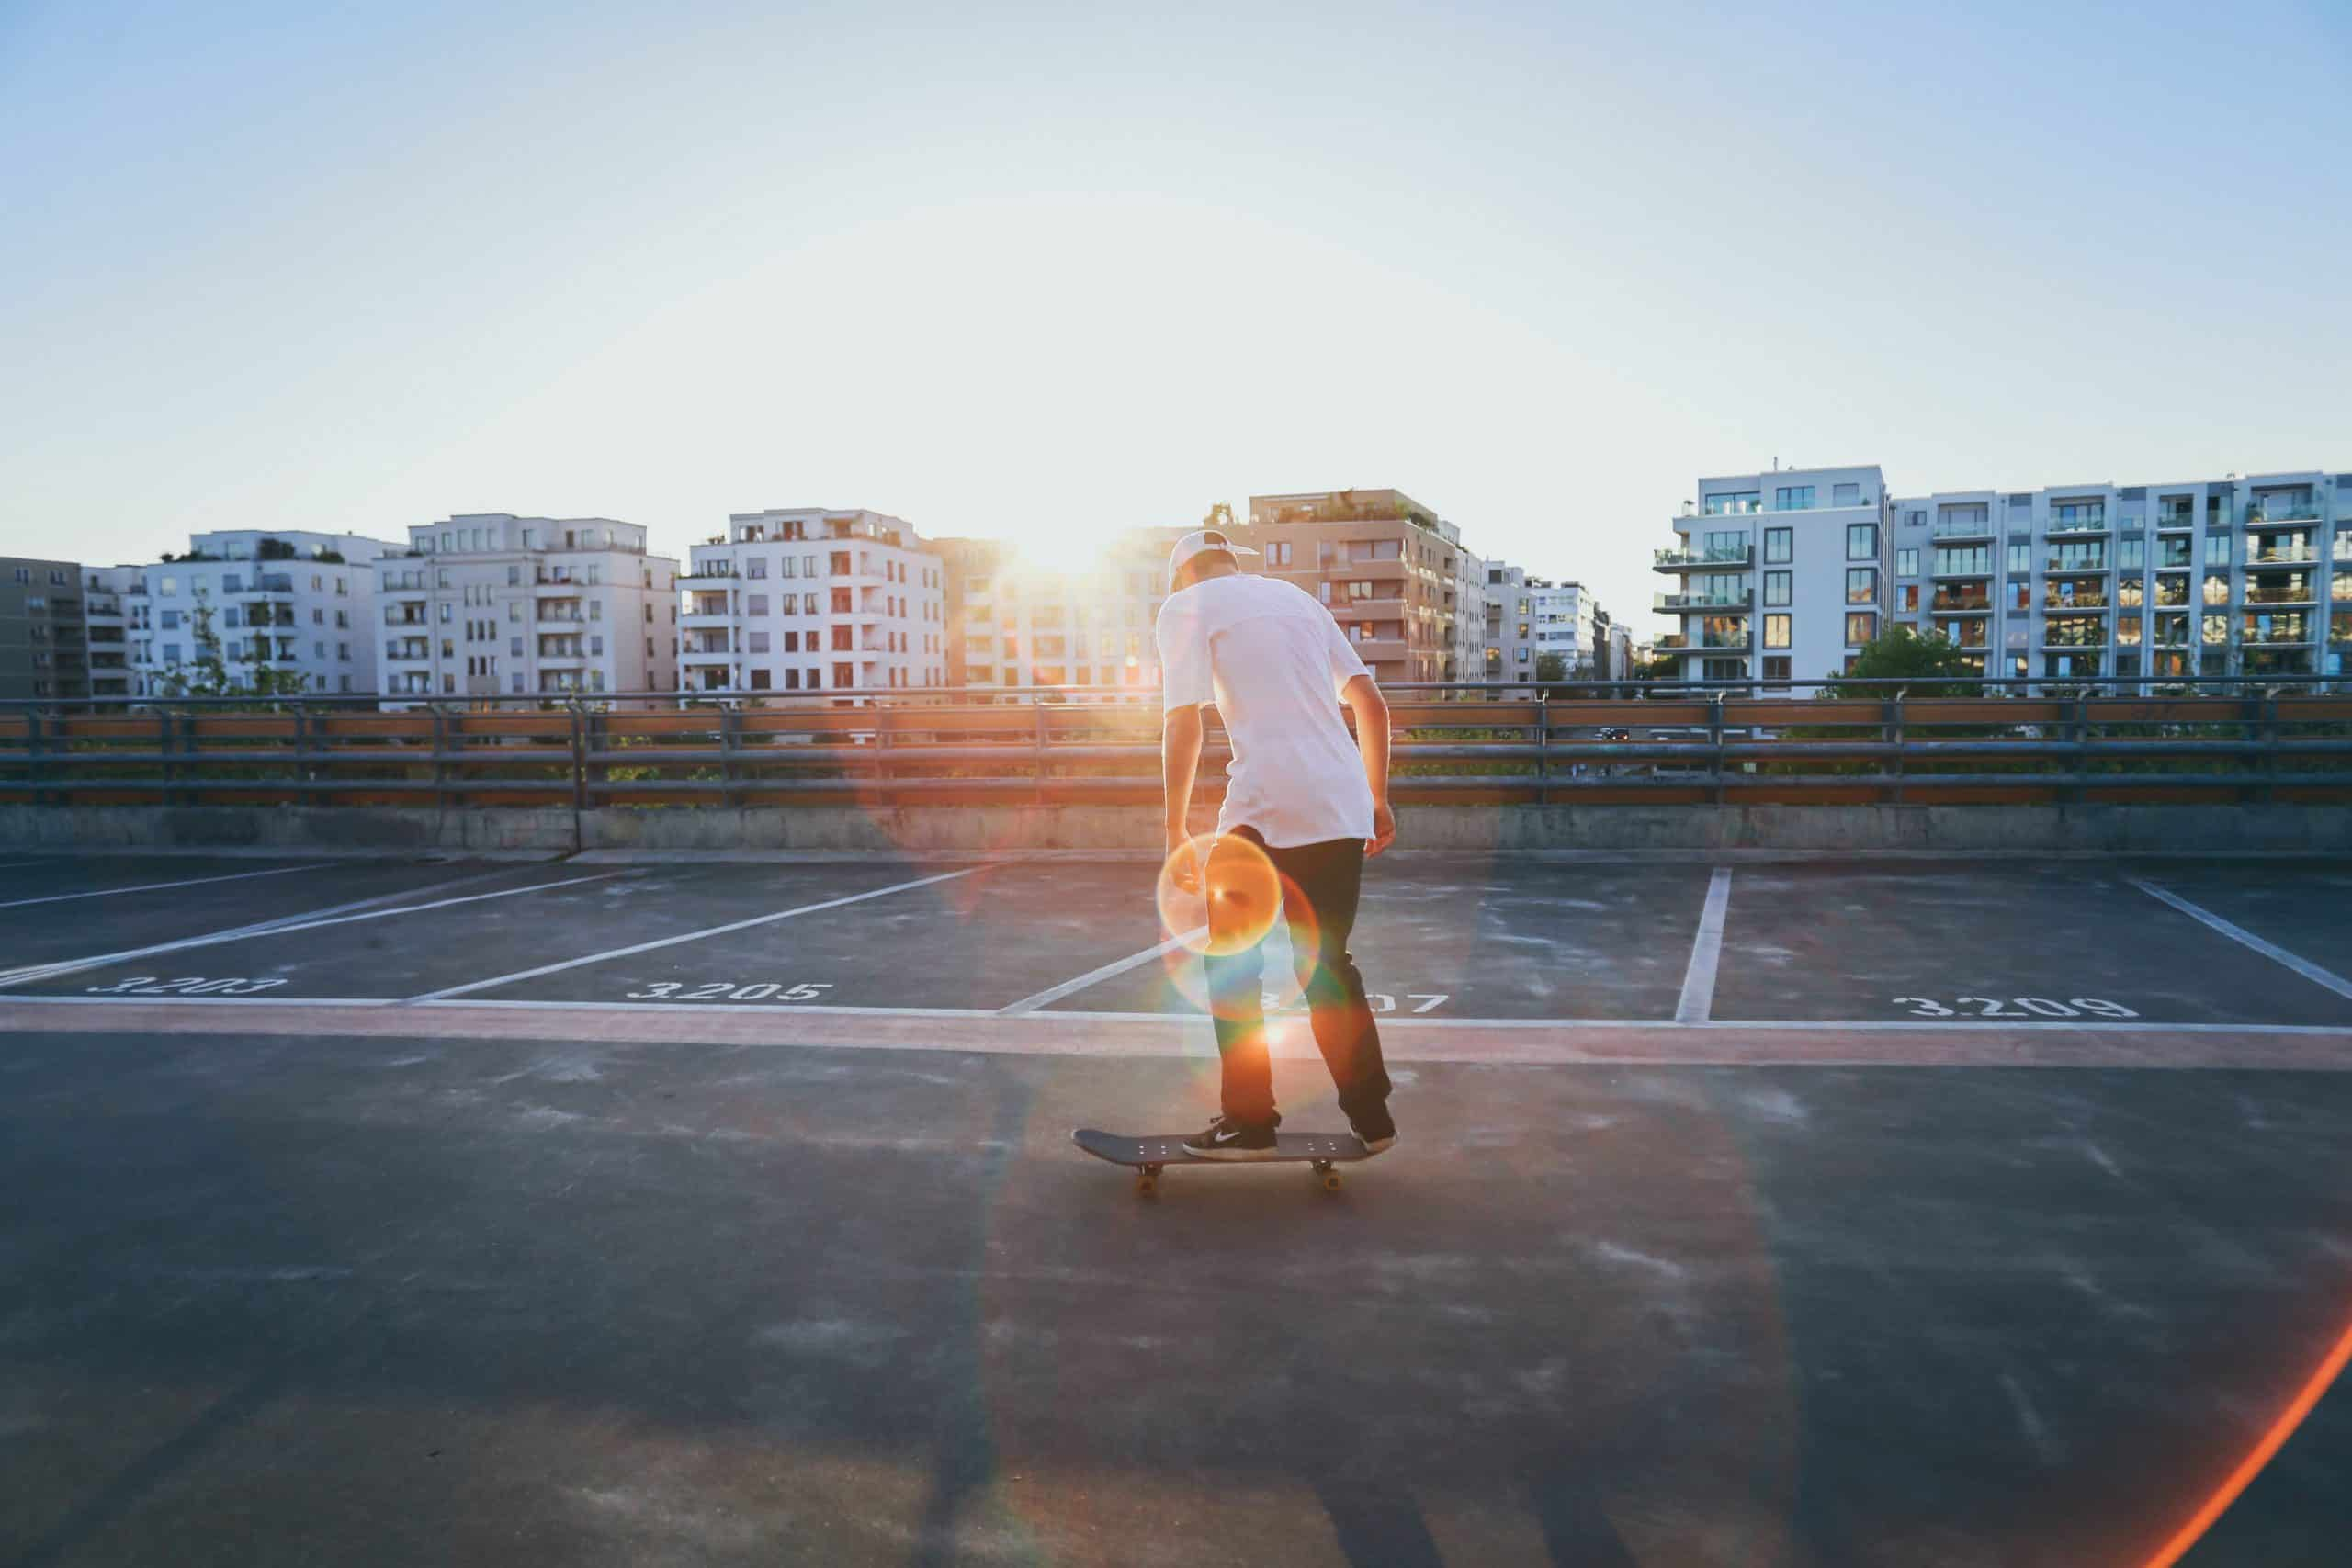 skateboard tips